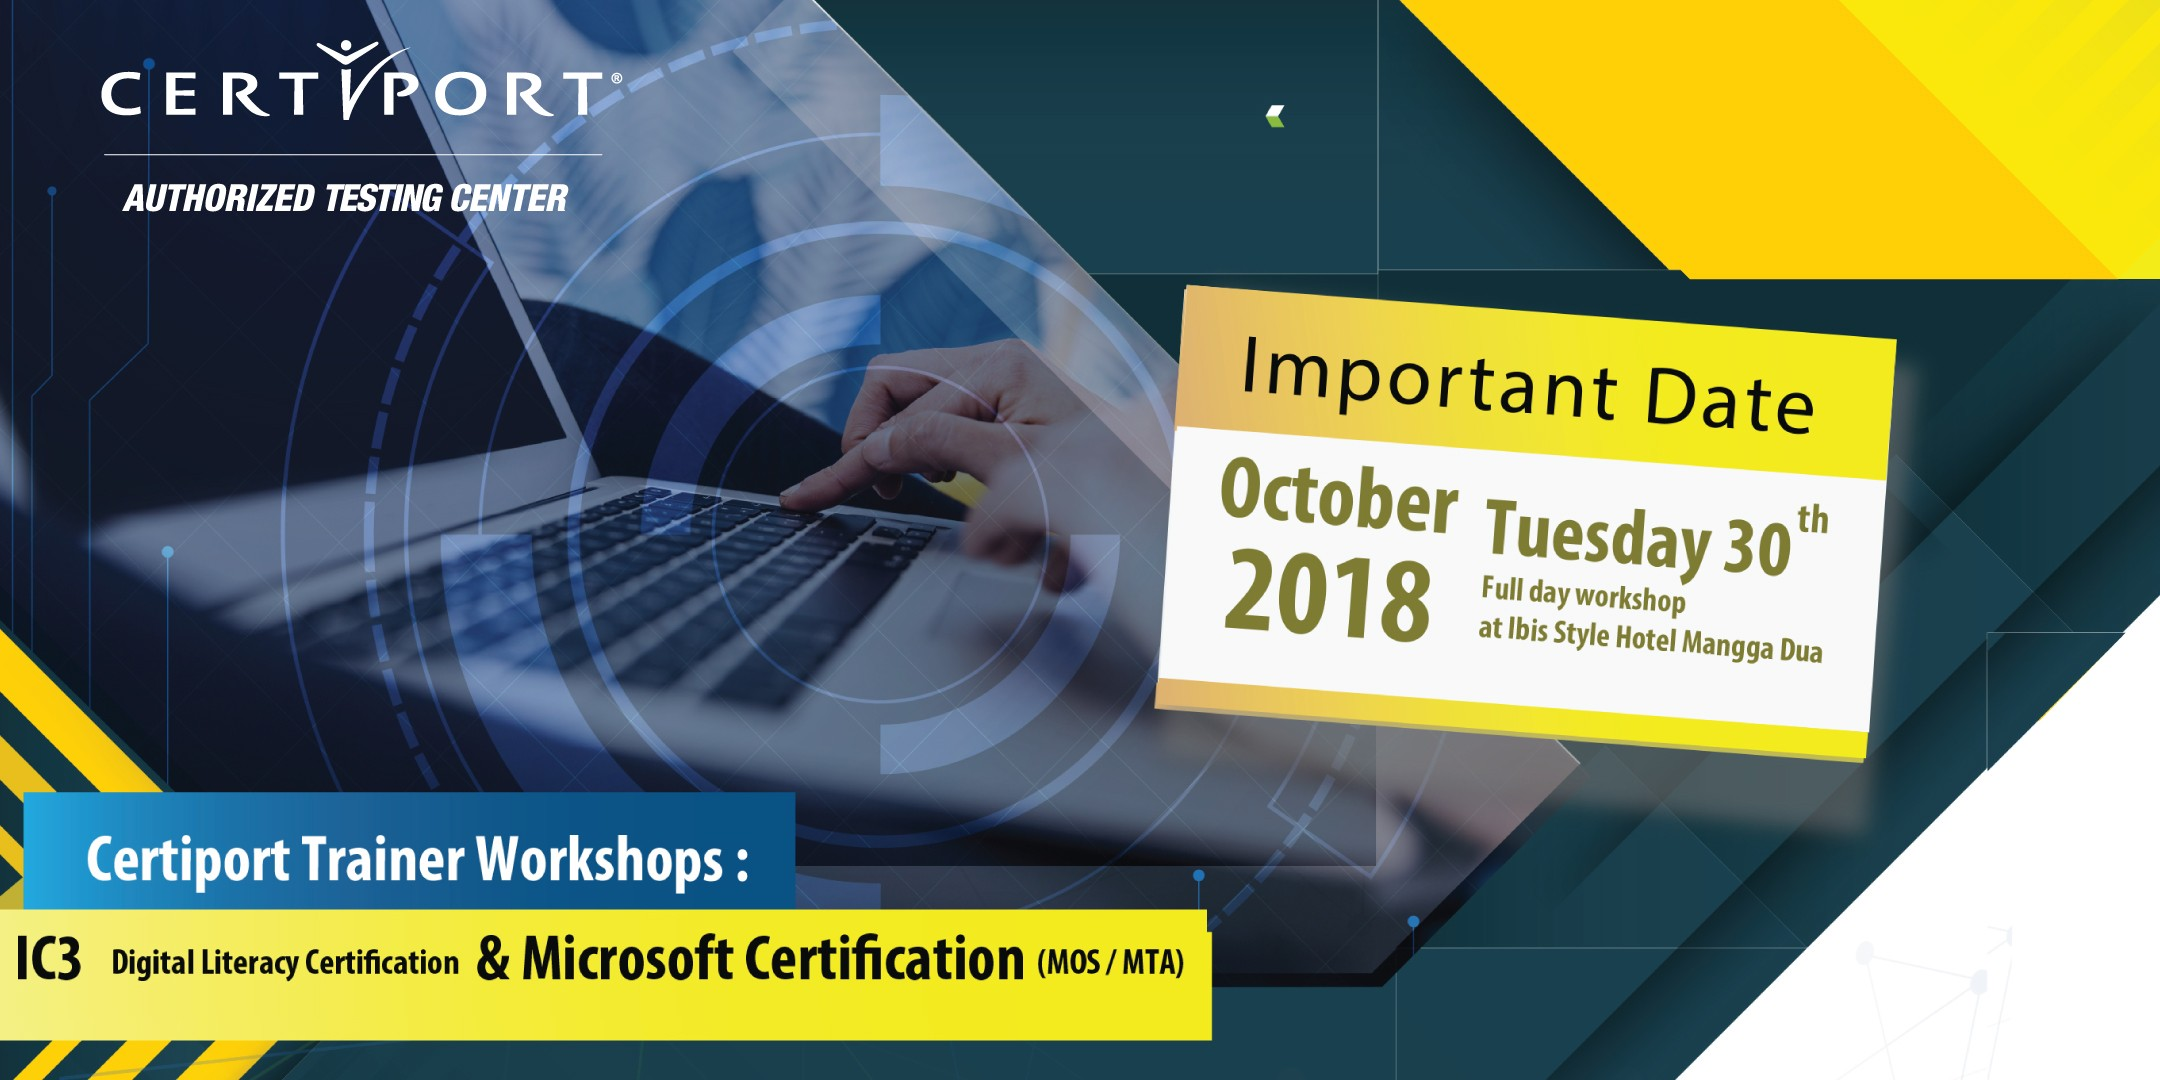 Certiport Trainer Workshops Ic3 Digital Literacy Certification